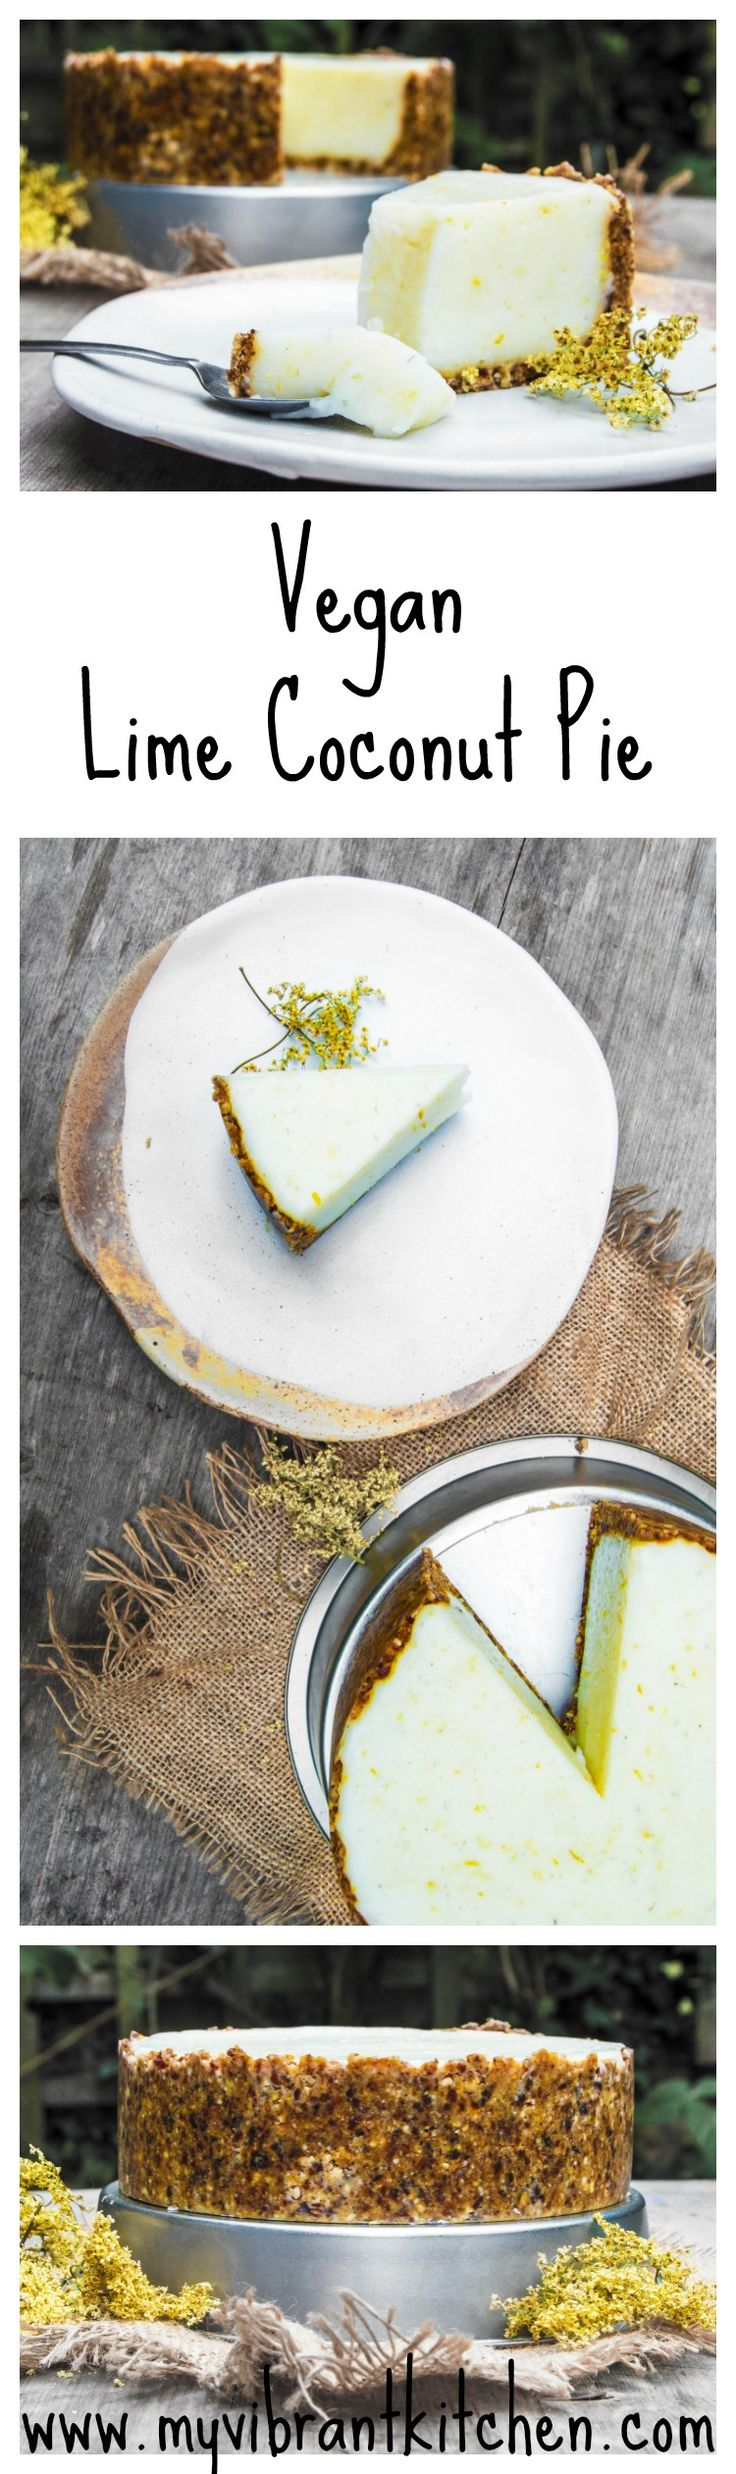 My Vibrant Kitchen | Vegan Lime Coconut Pie | http://myvibrantkitchen.com